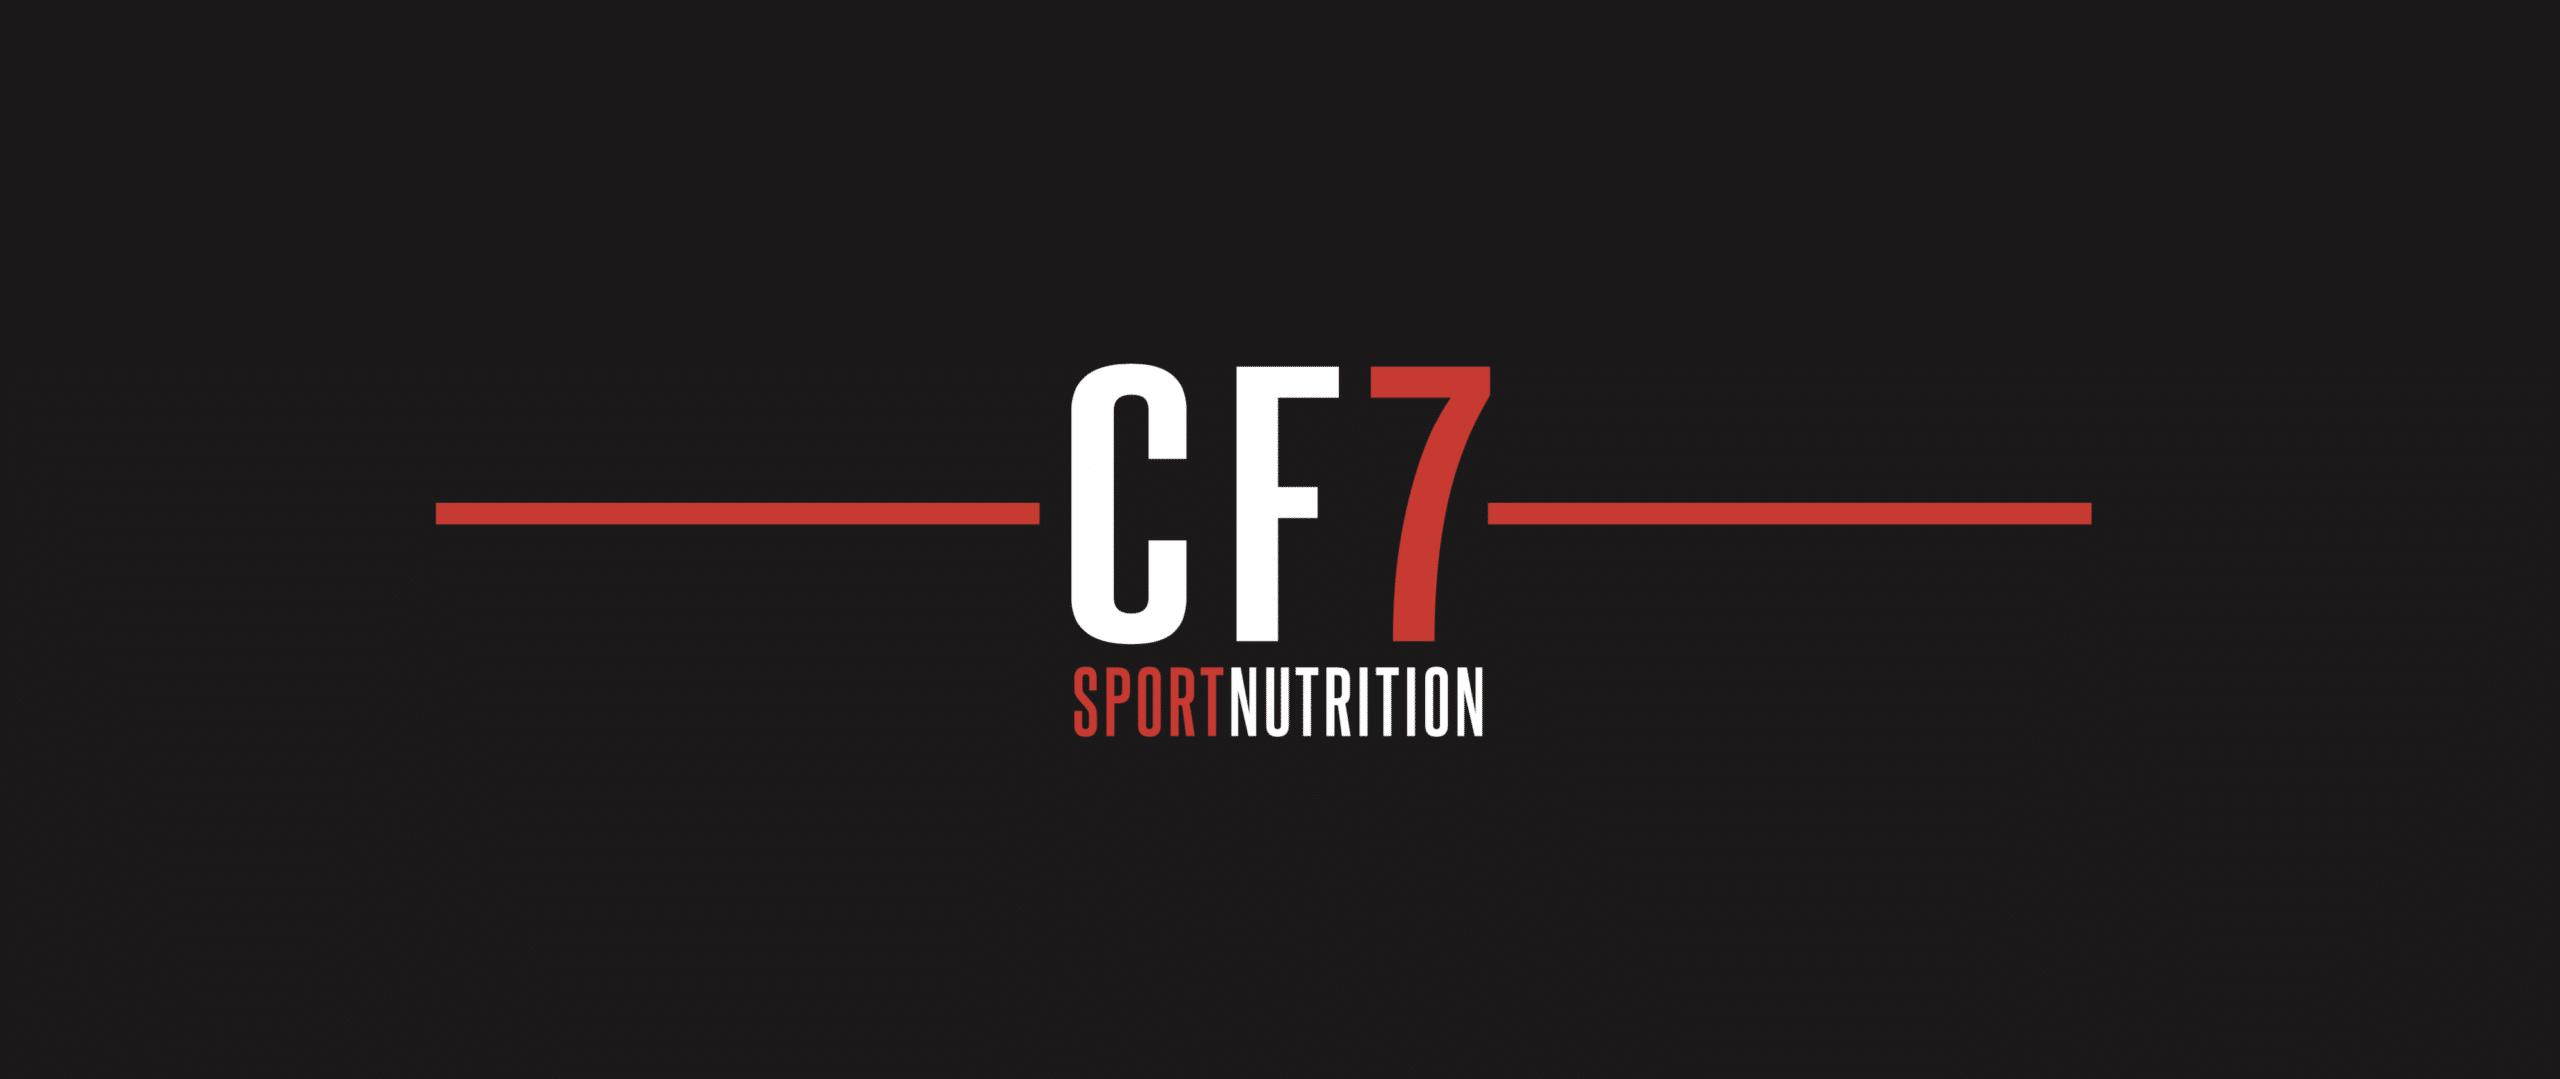 (c) Cf7.fr